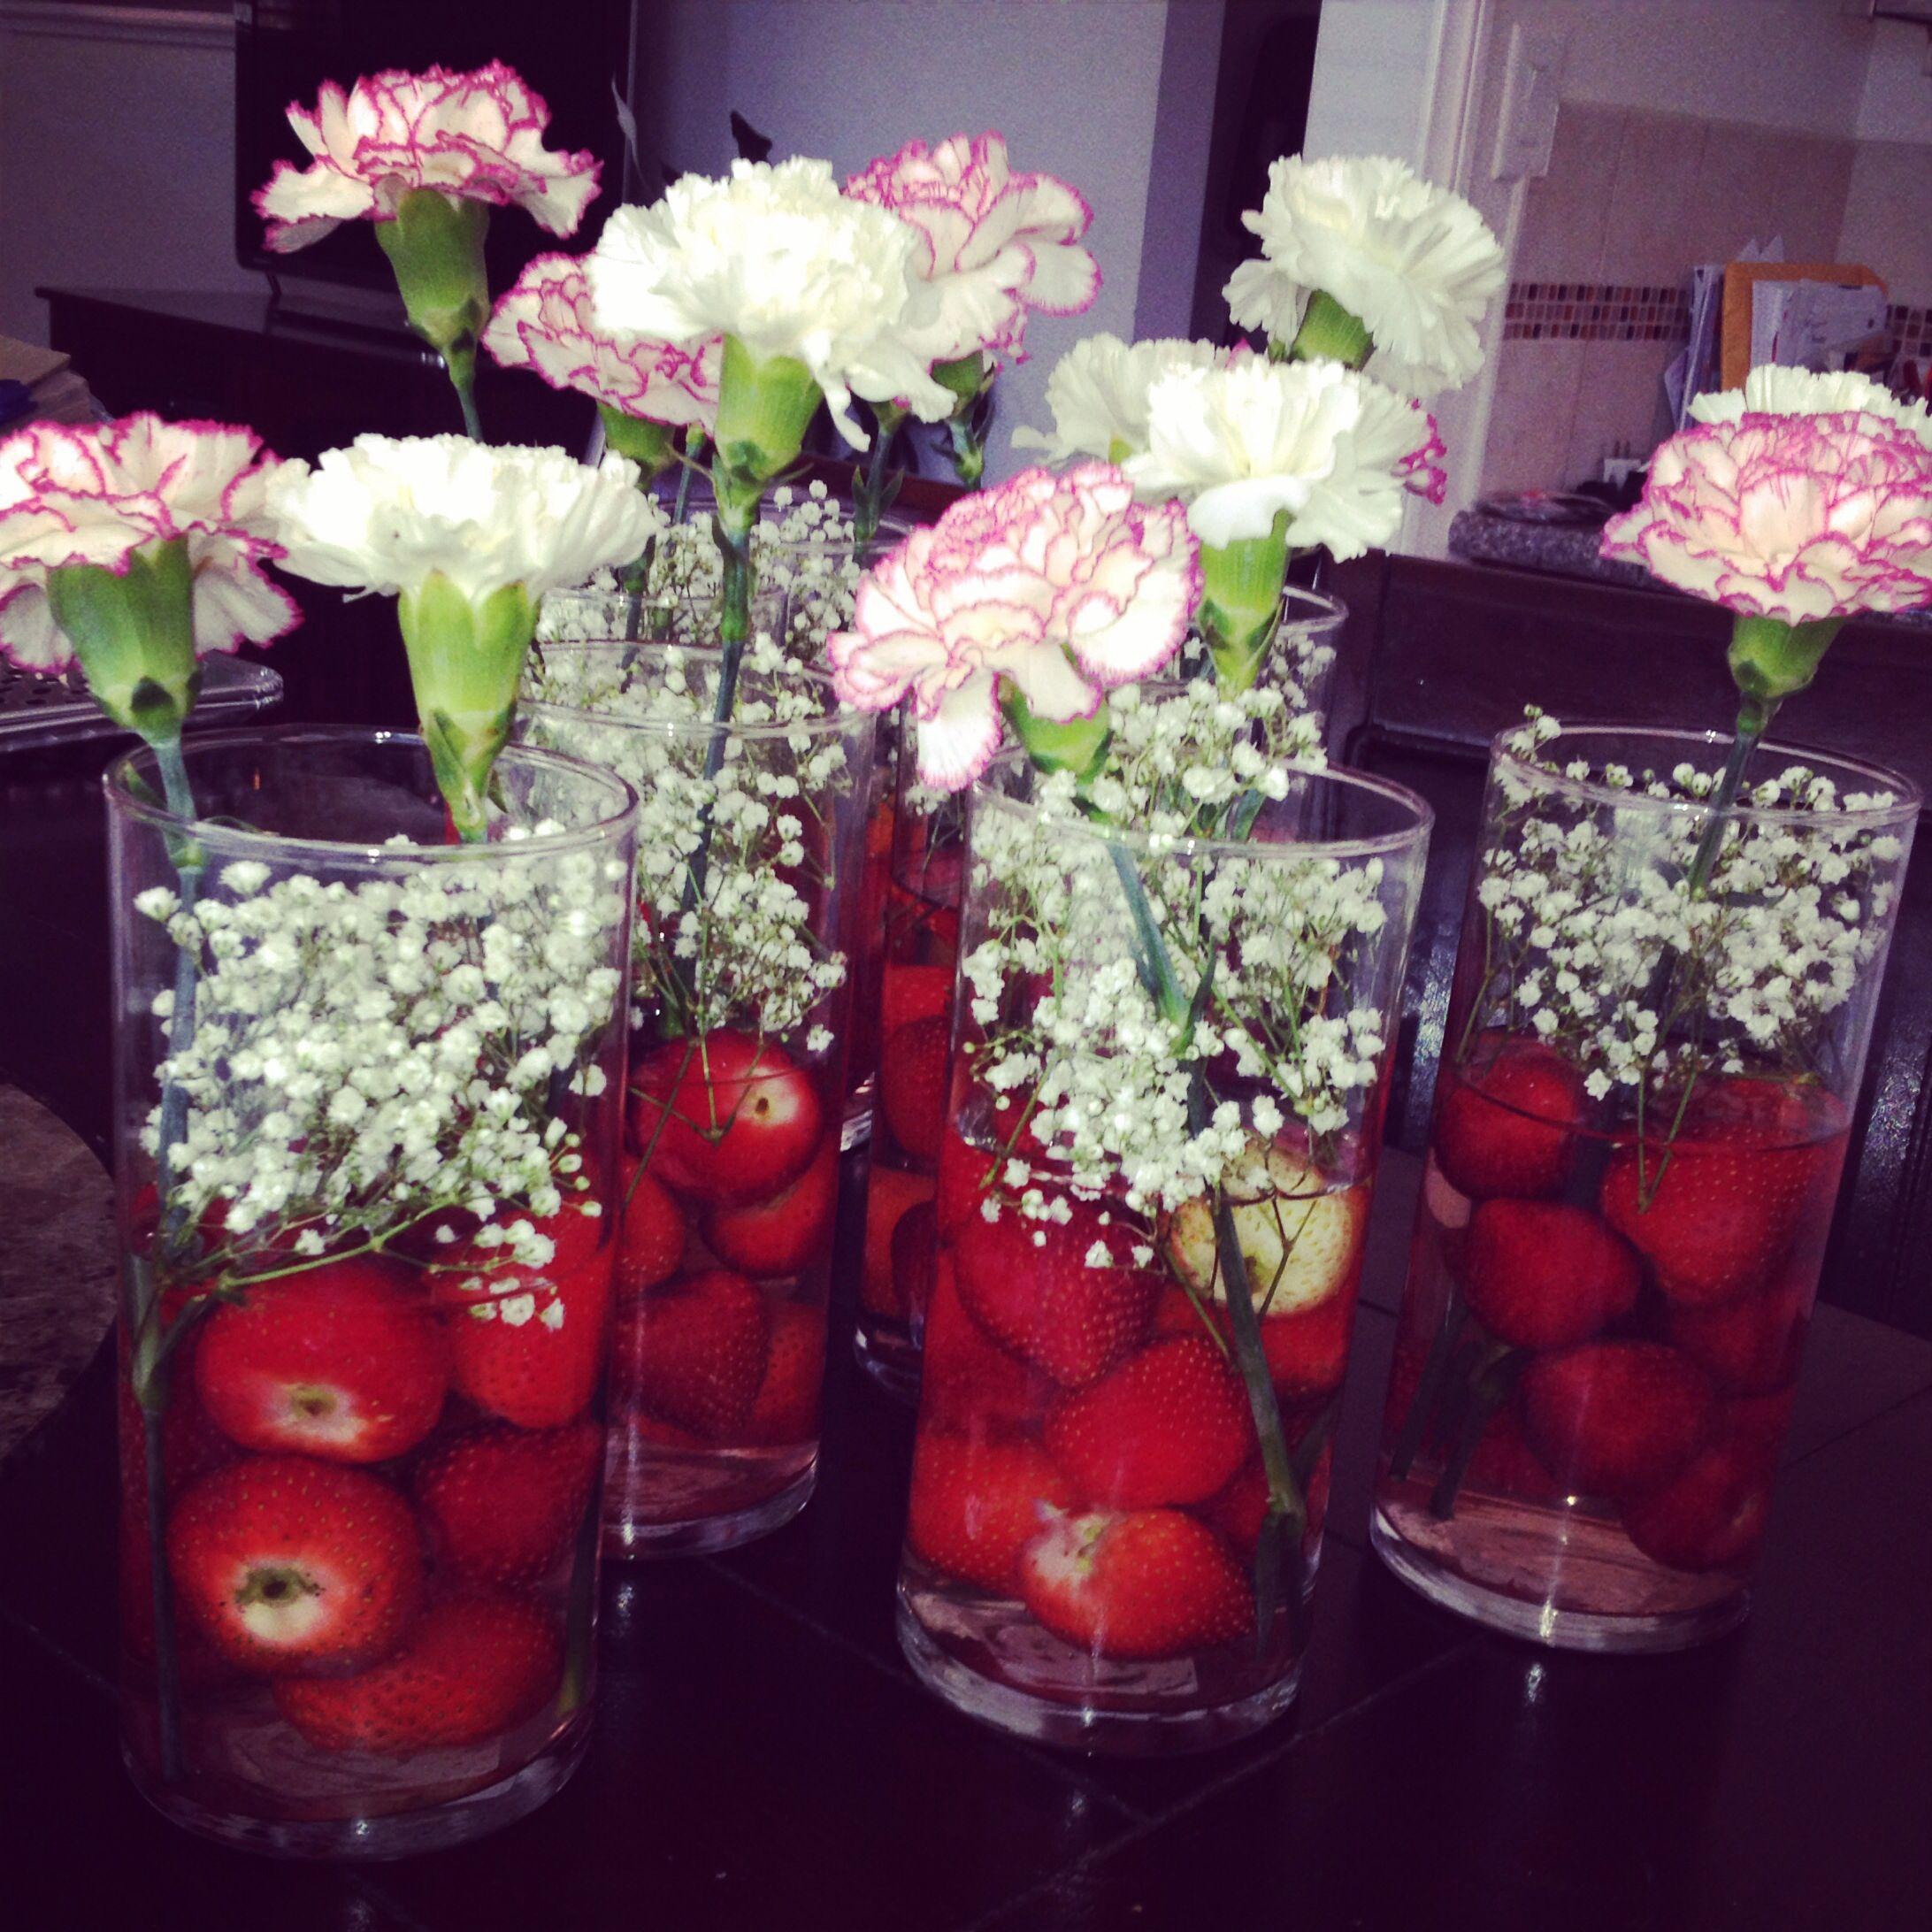 Strawberry shortcake centerpieces